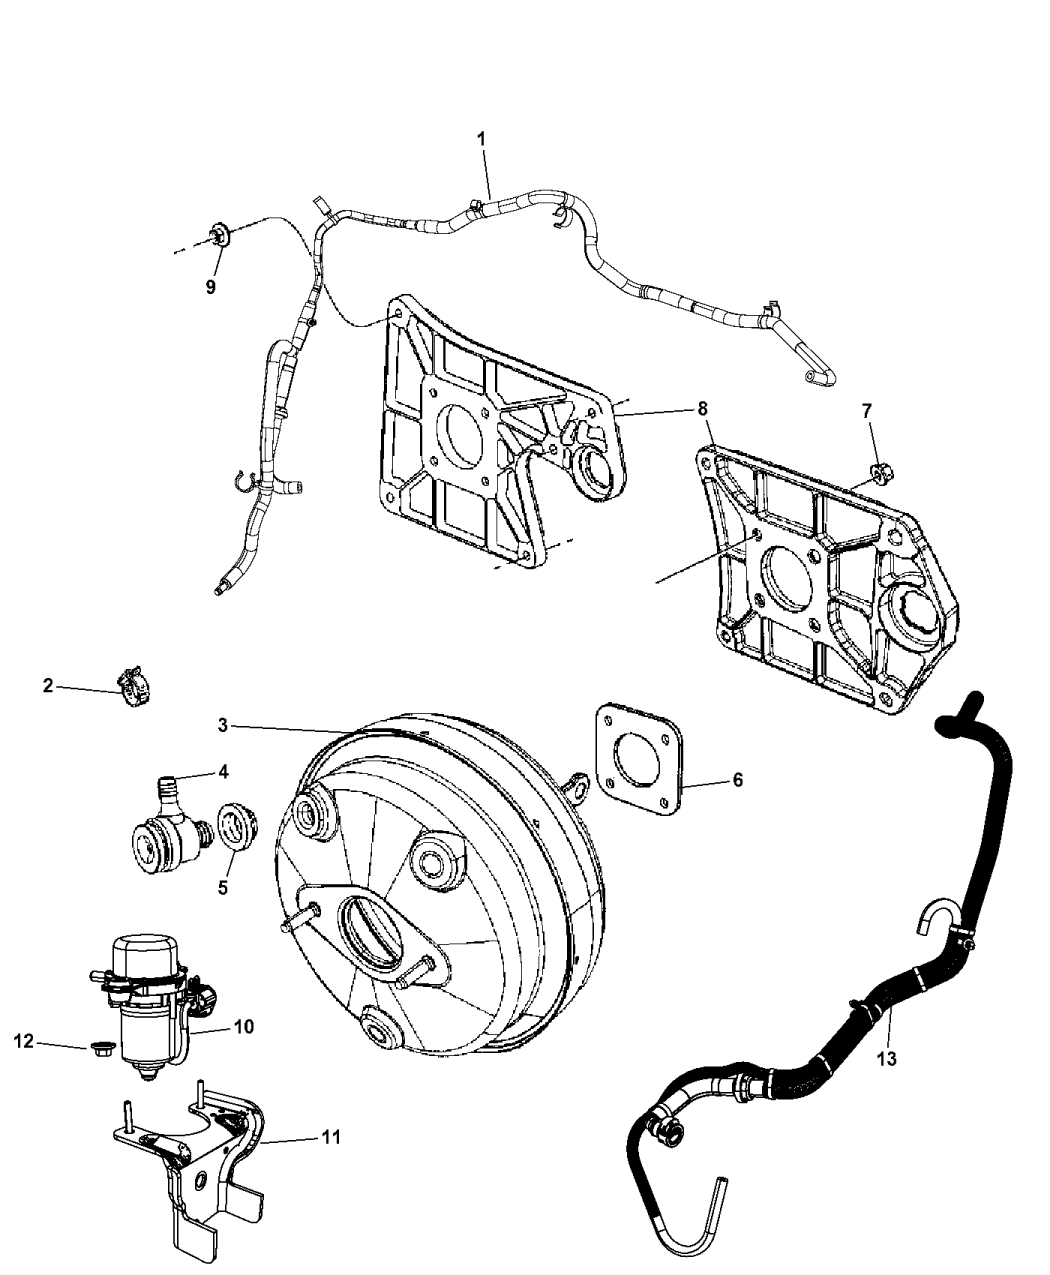 2012 jeep wrangler wiring diagram